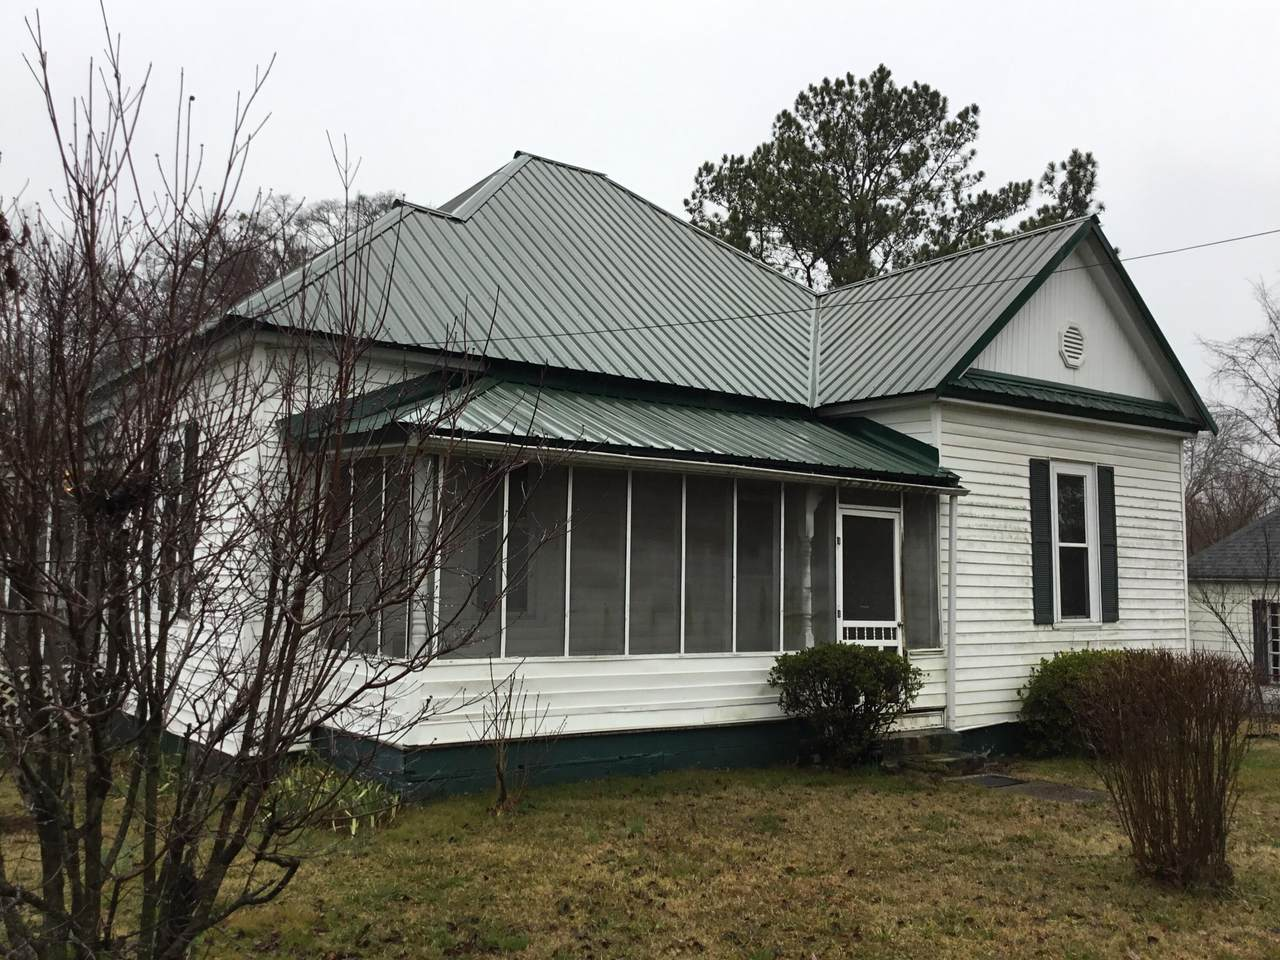 807 Crittenden Ave - Photo 1